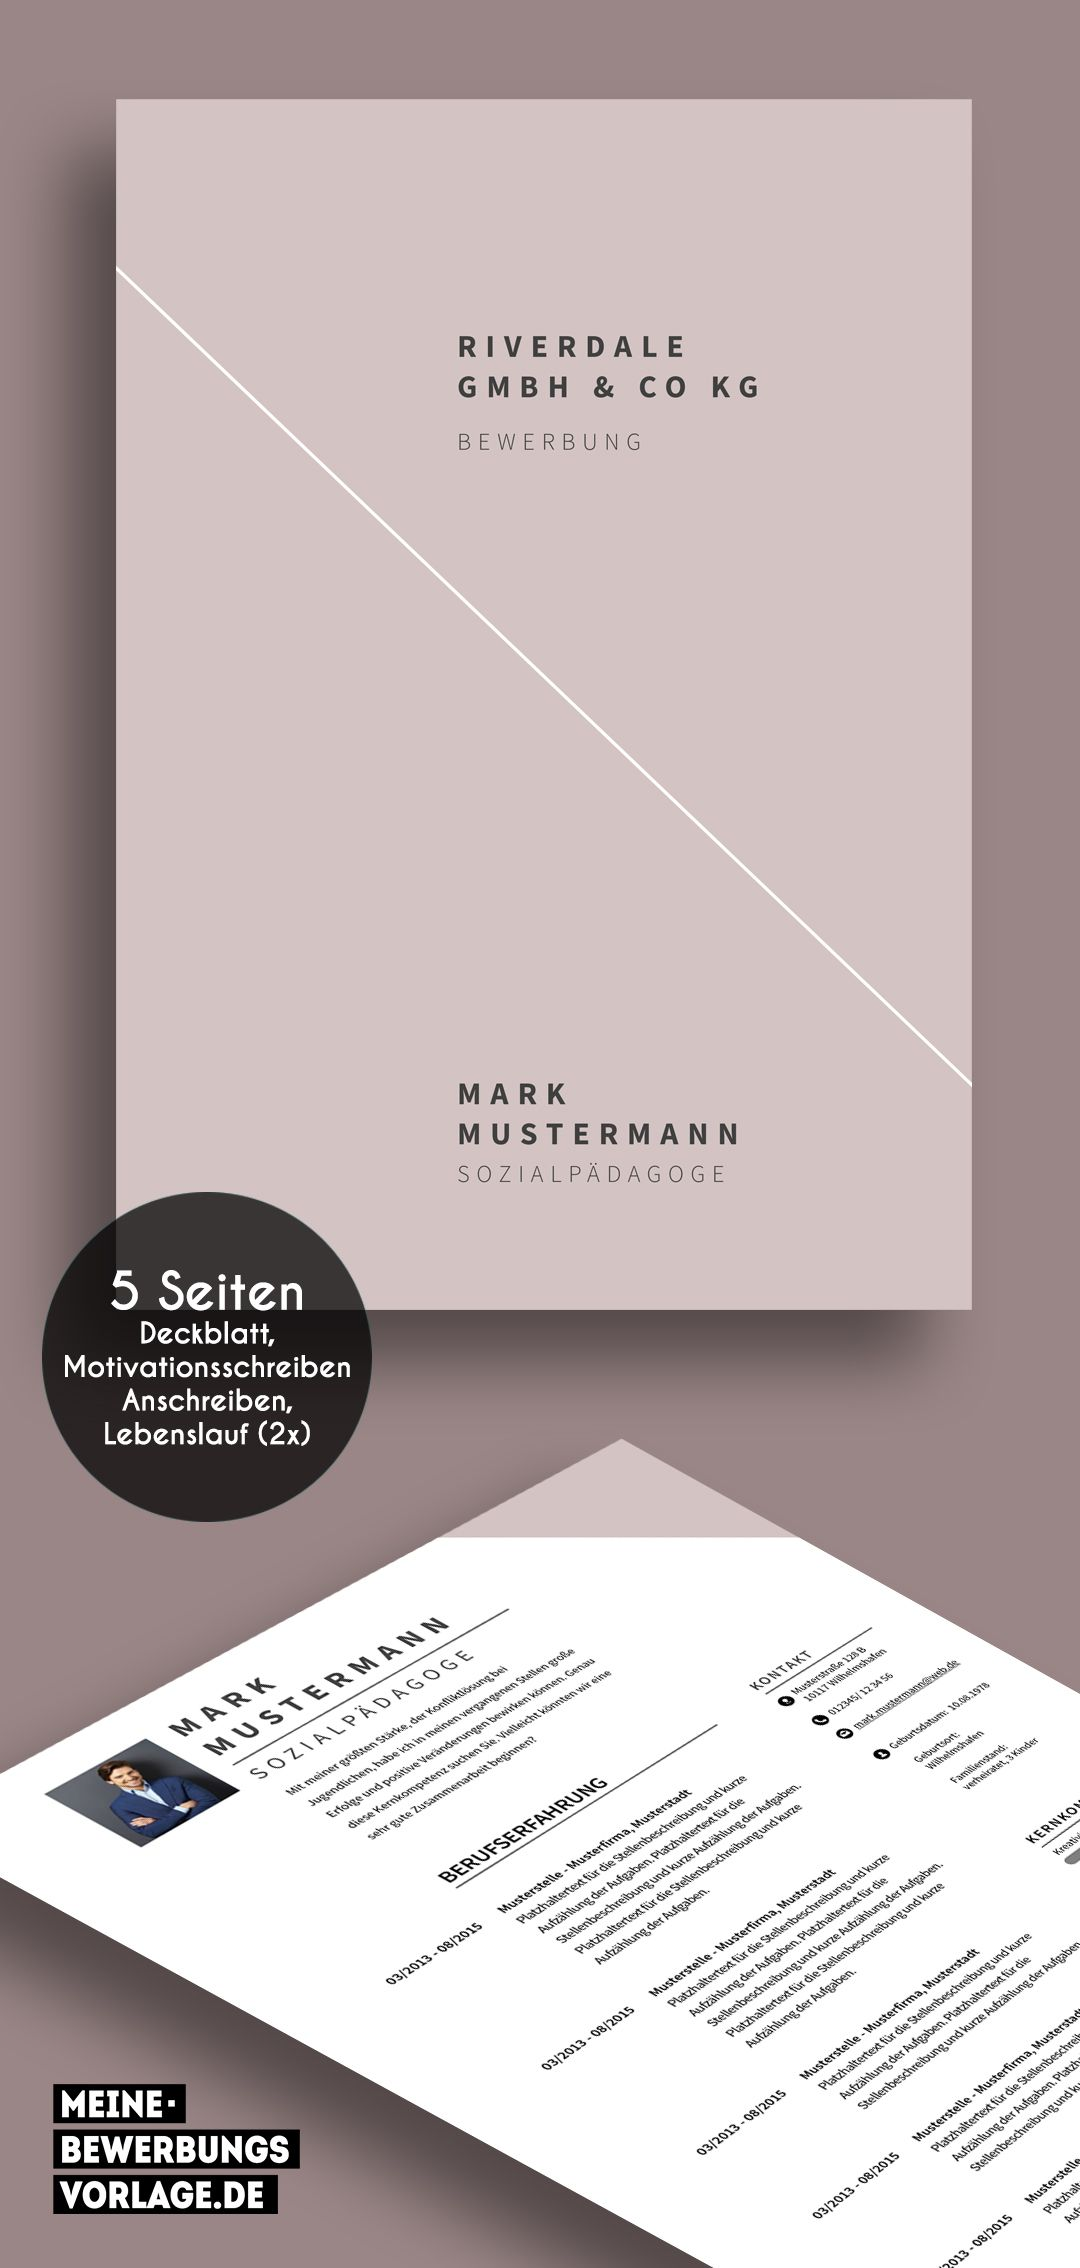 No 13 Vorlage Deckblatt Bewerbung Bewerbung Layout Deckblatt Bewerbung